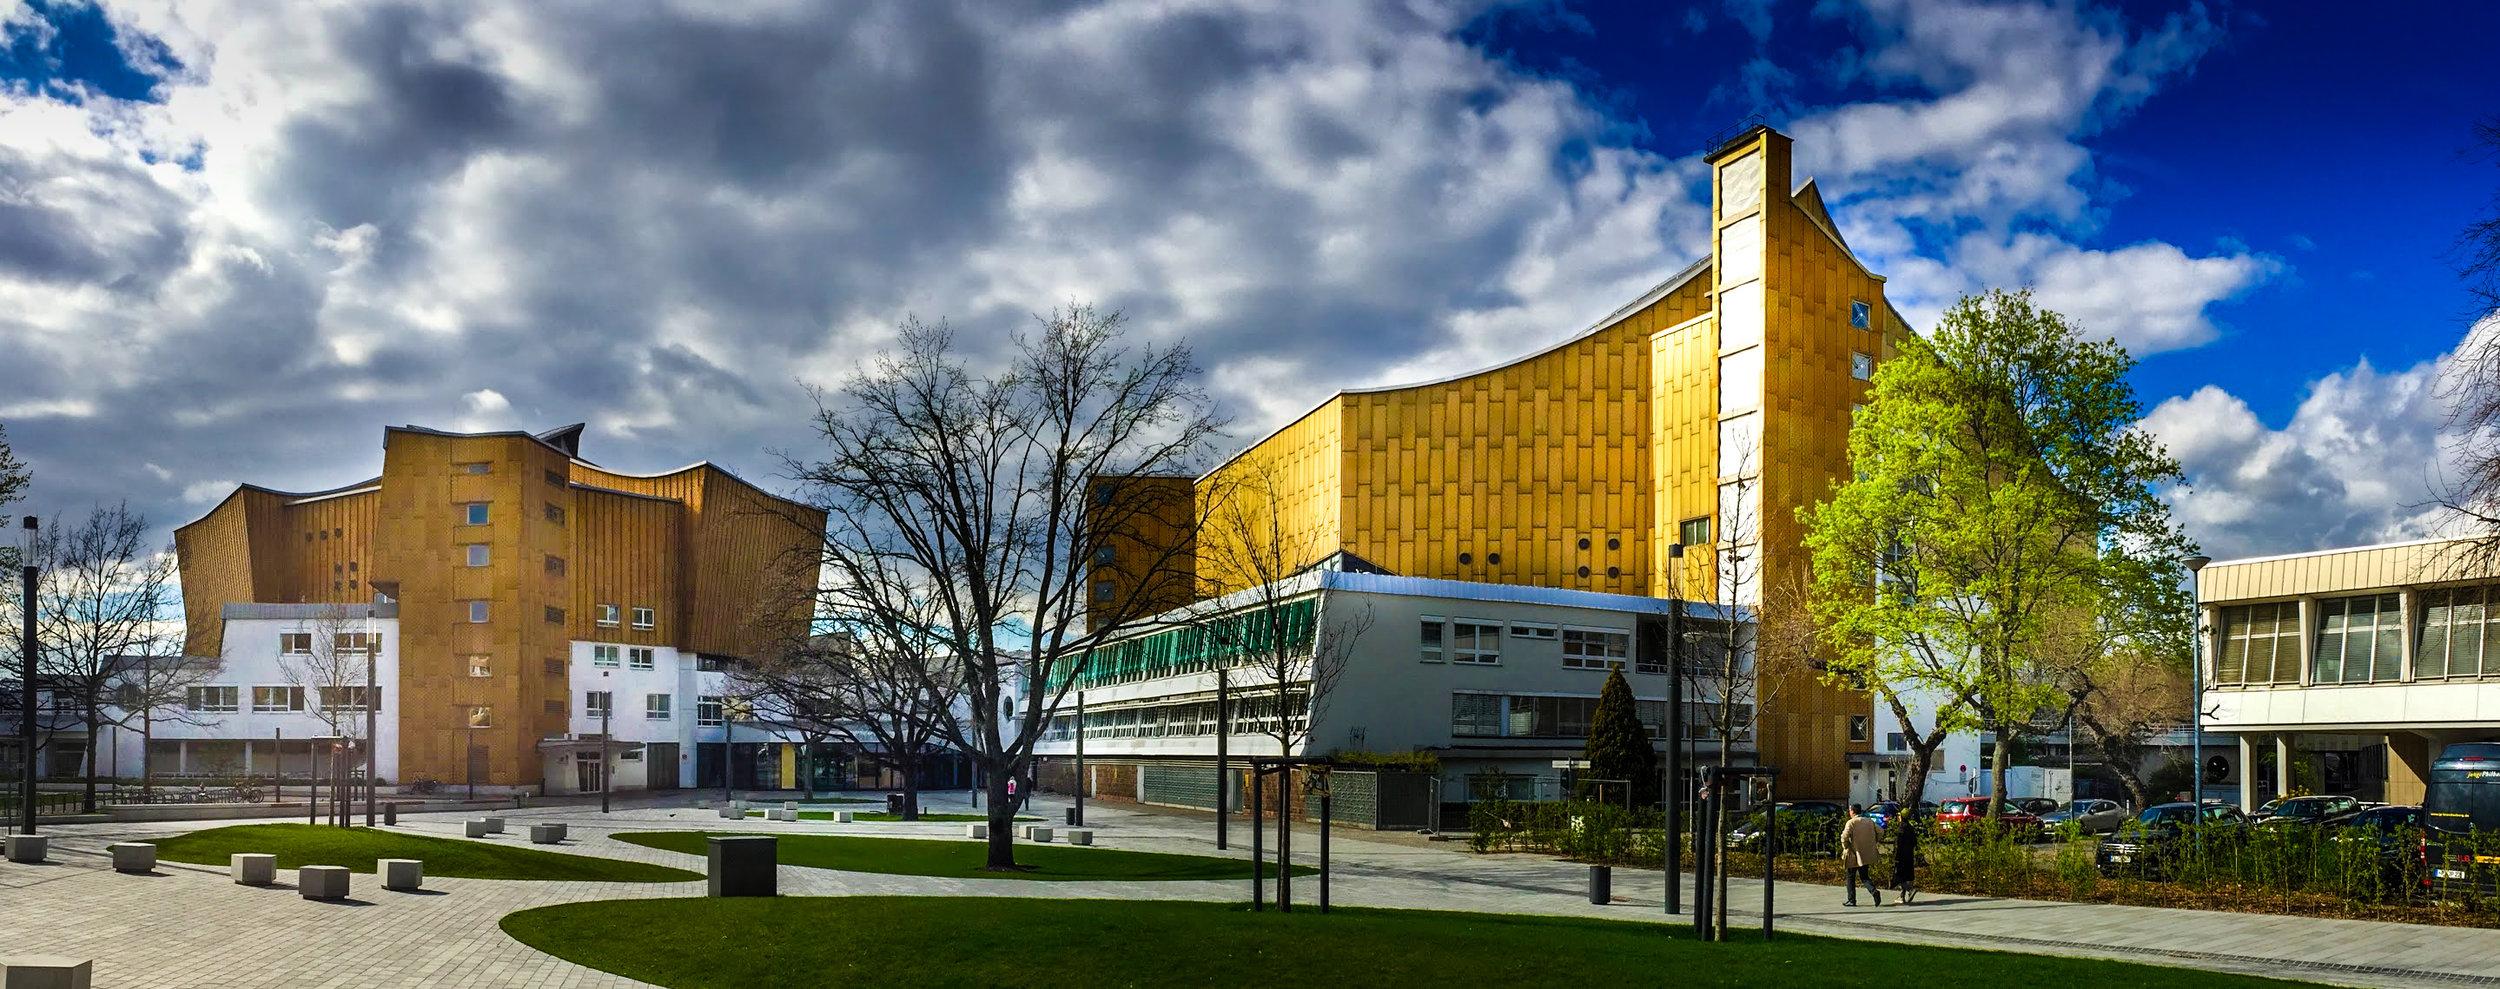 Berlin Philharmonic buildings